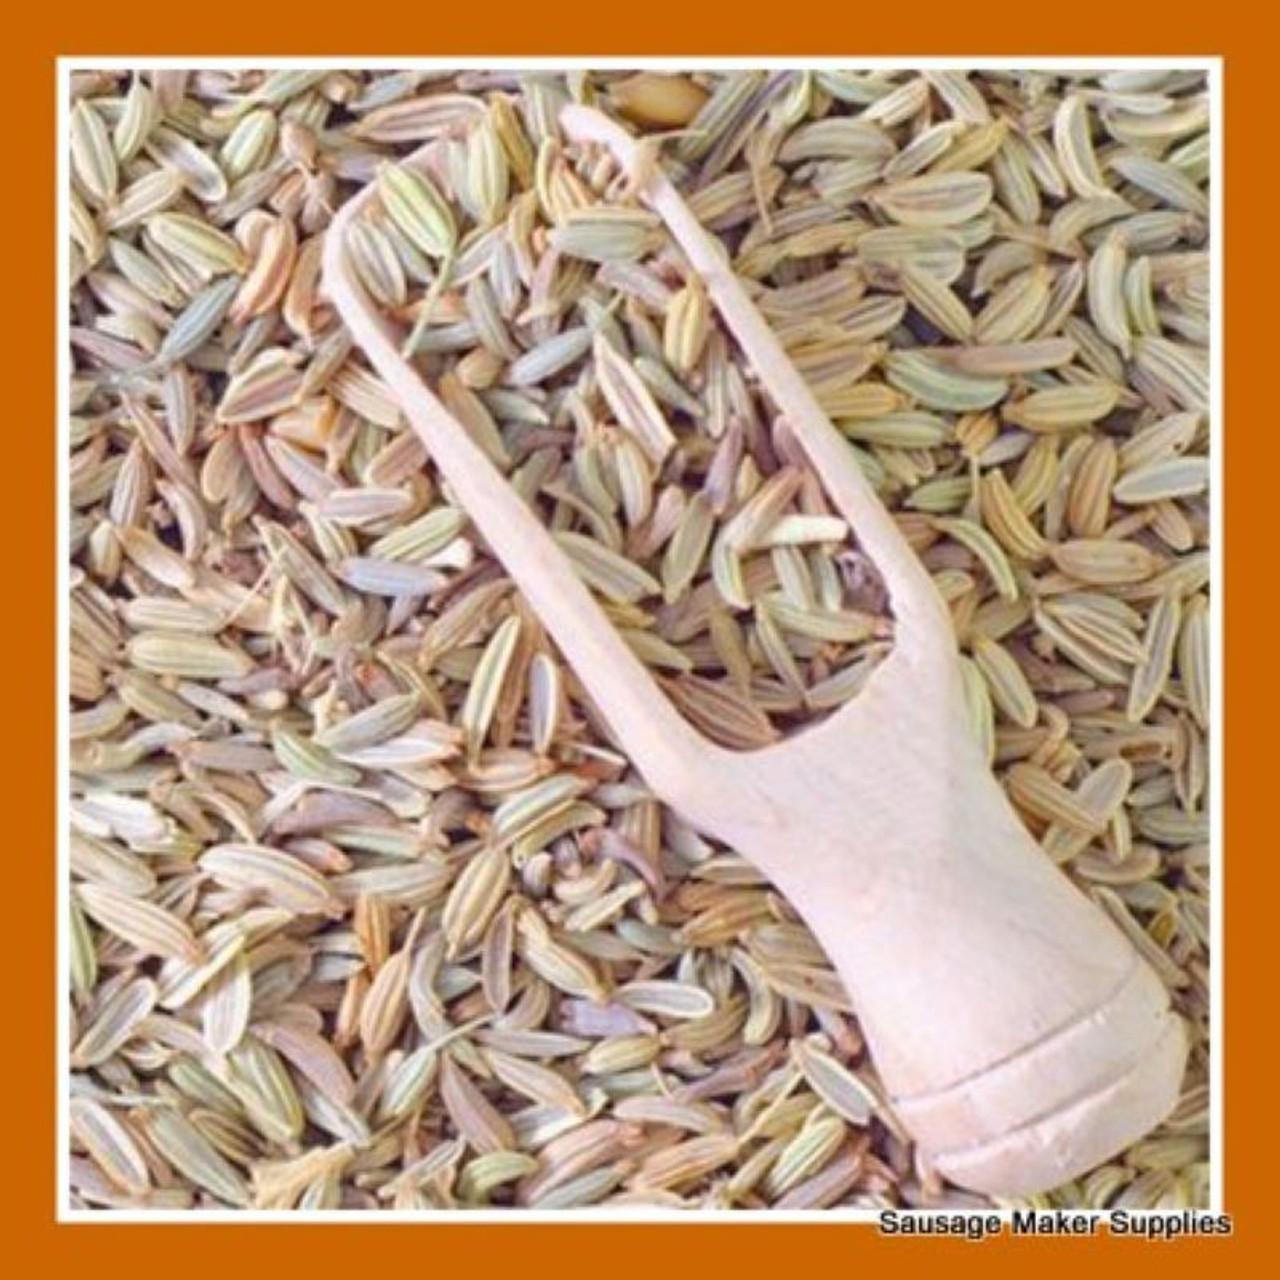 A.C. LEGG Fennel Seed - 7 OZ BOTTLE